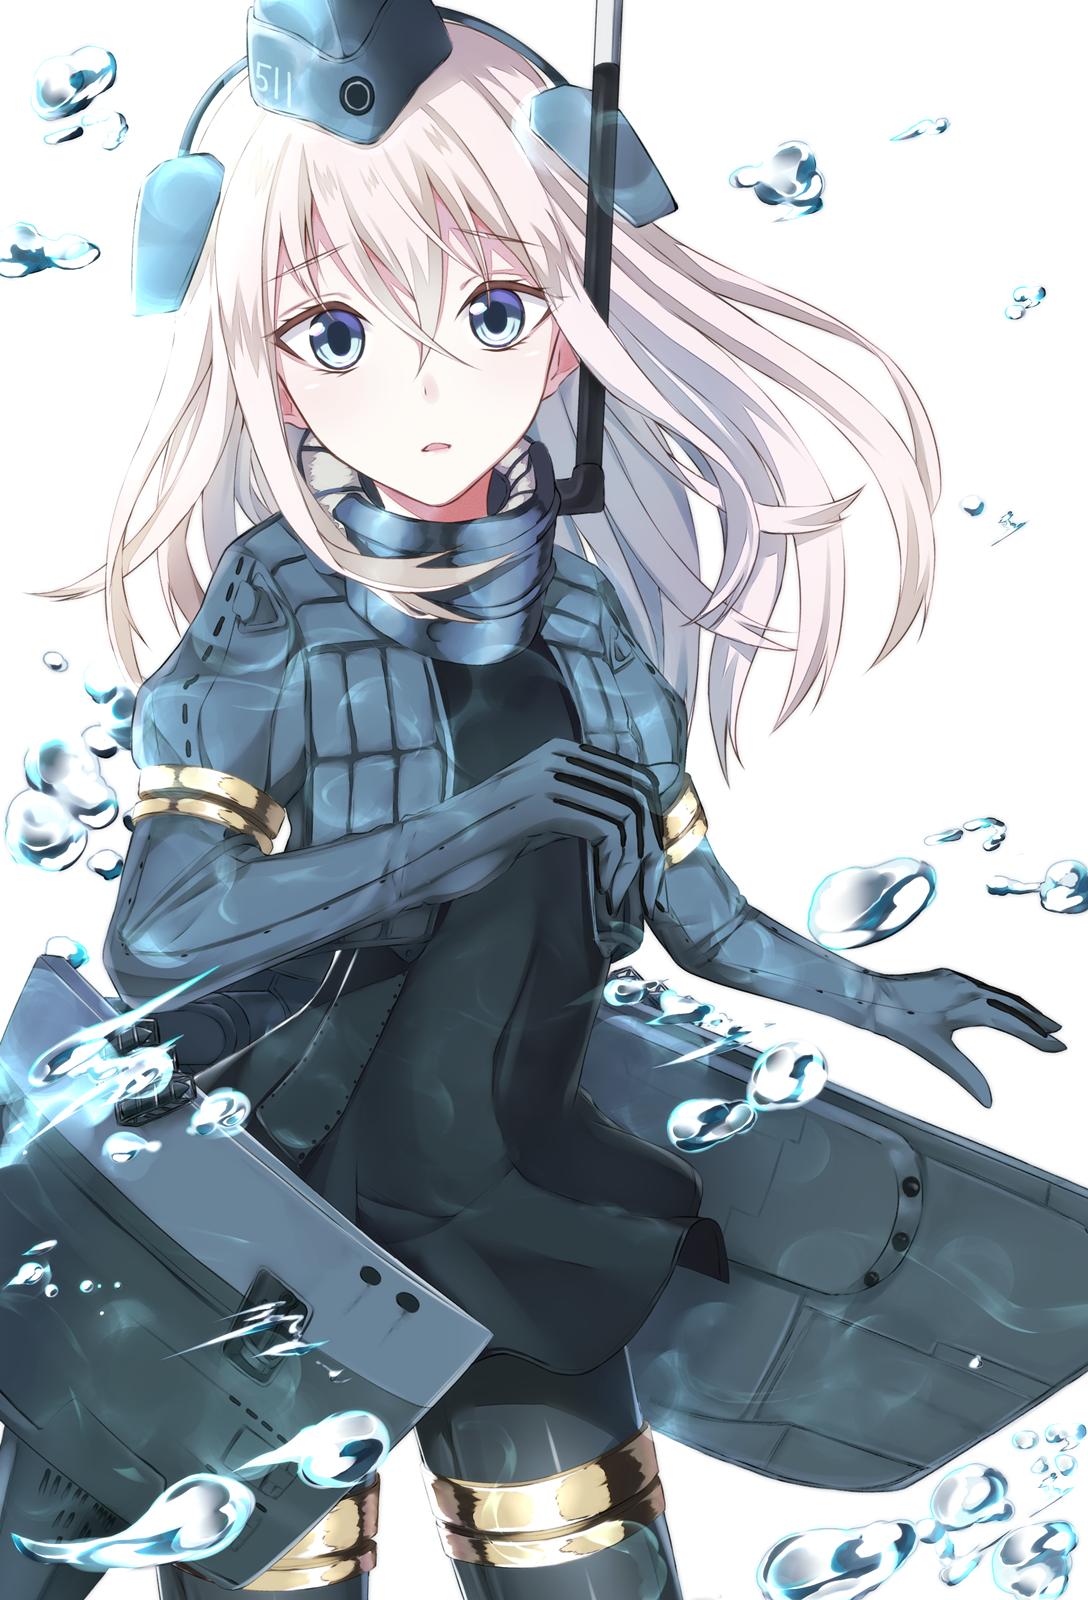 "u-511"" | u-511<3 | pinterest | かっこいい潜水艦の画像、アニメ、アート"